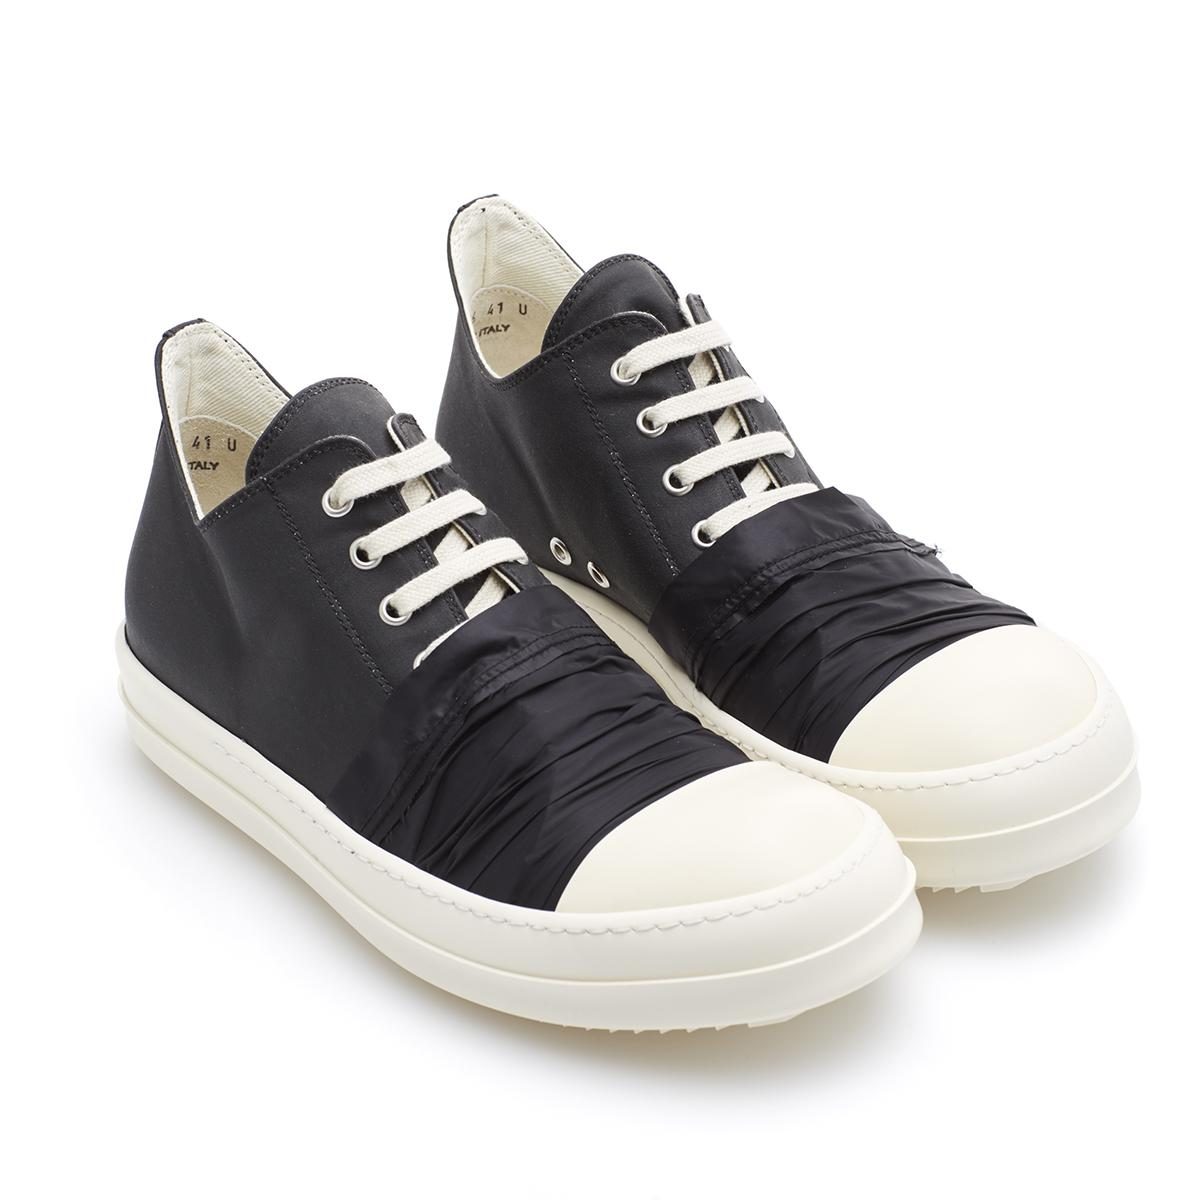 lyst rick owens drkshdw low sneakers in black for men. Black Bedroom Furniture Sets. Home Design Ideas